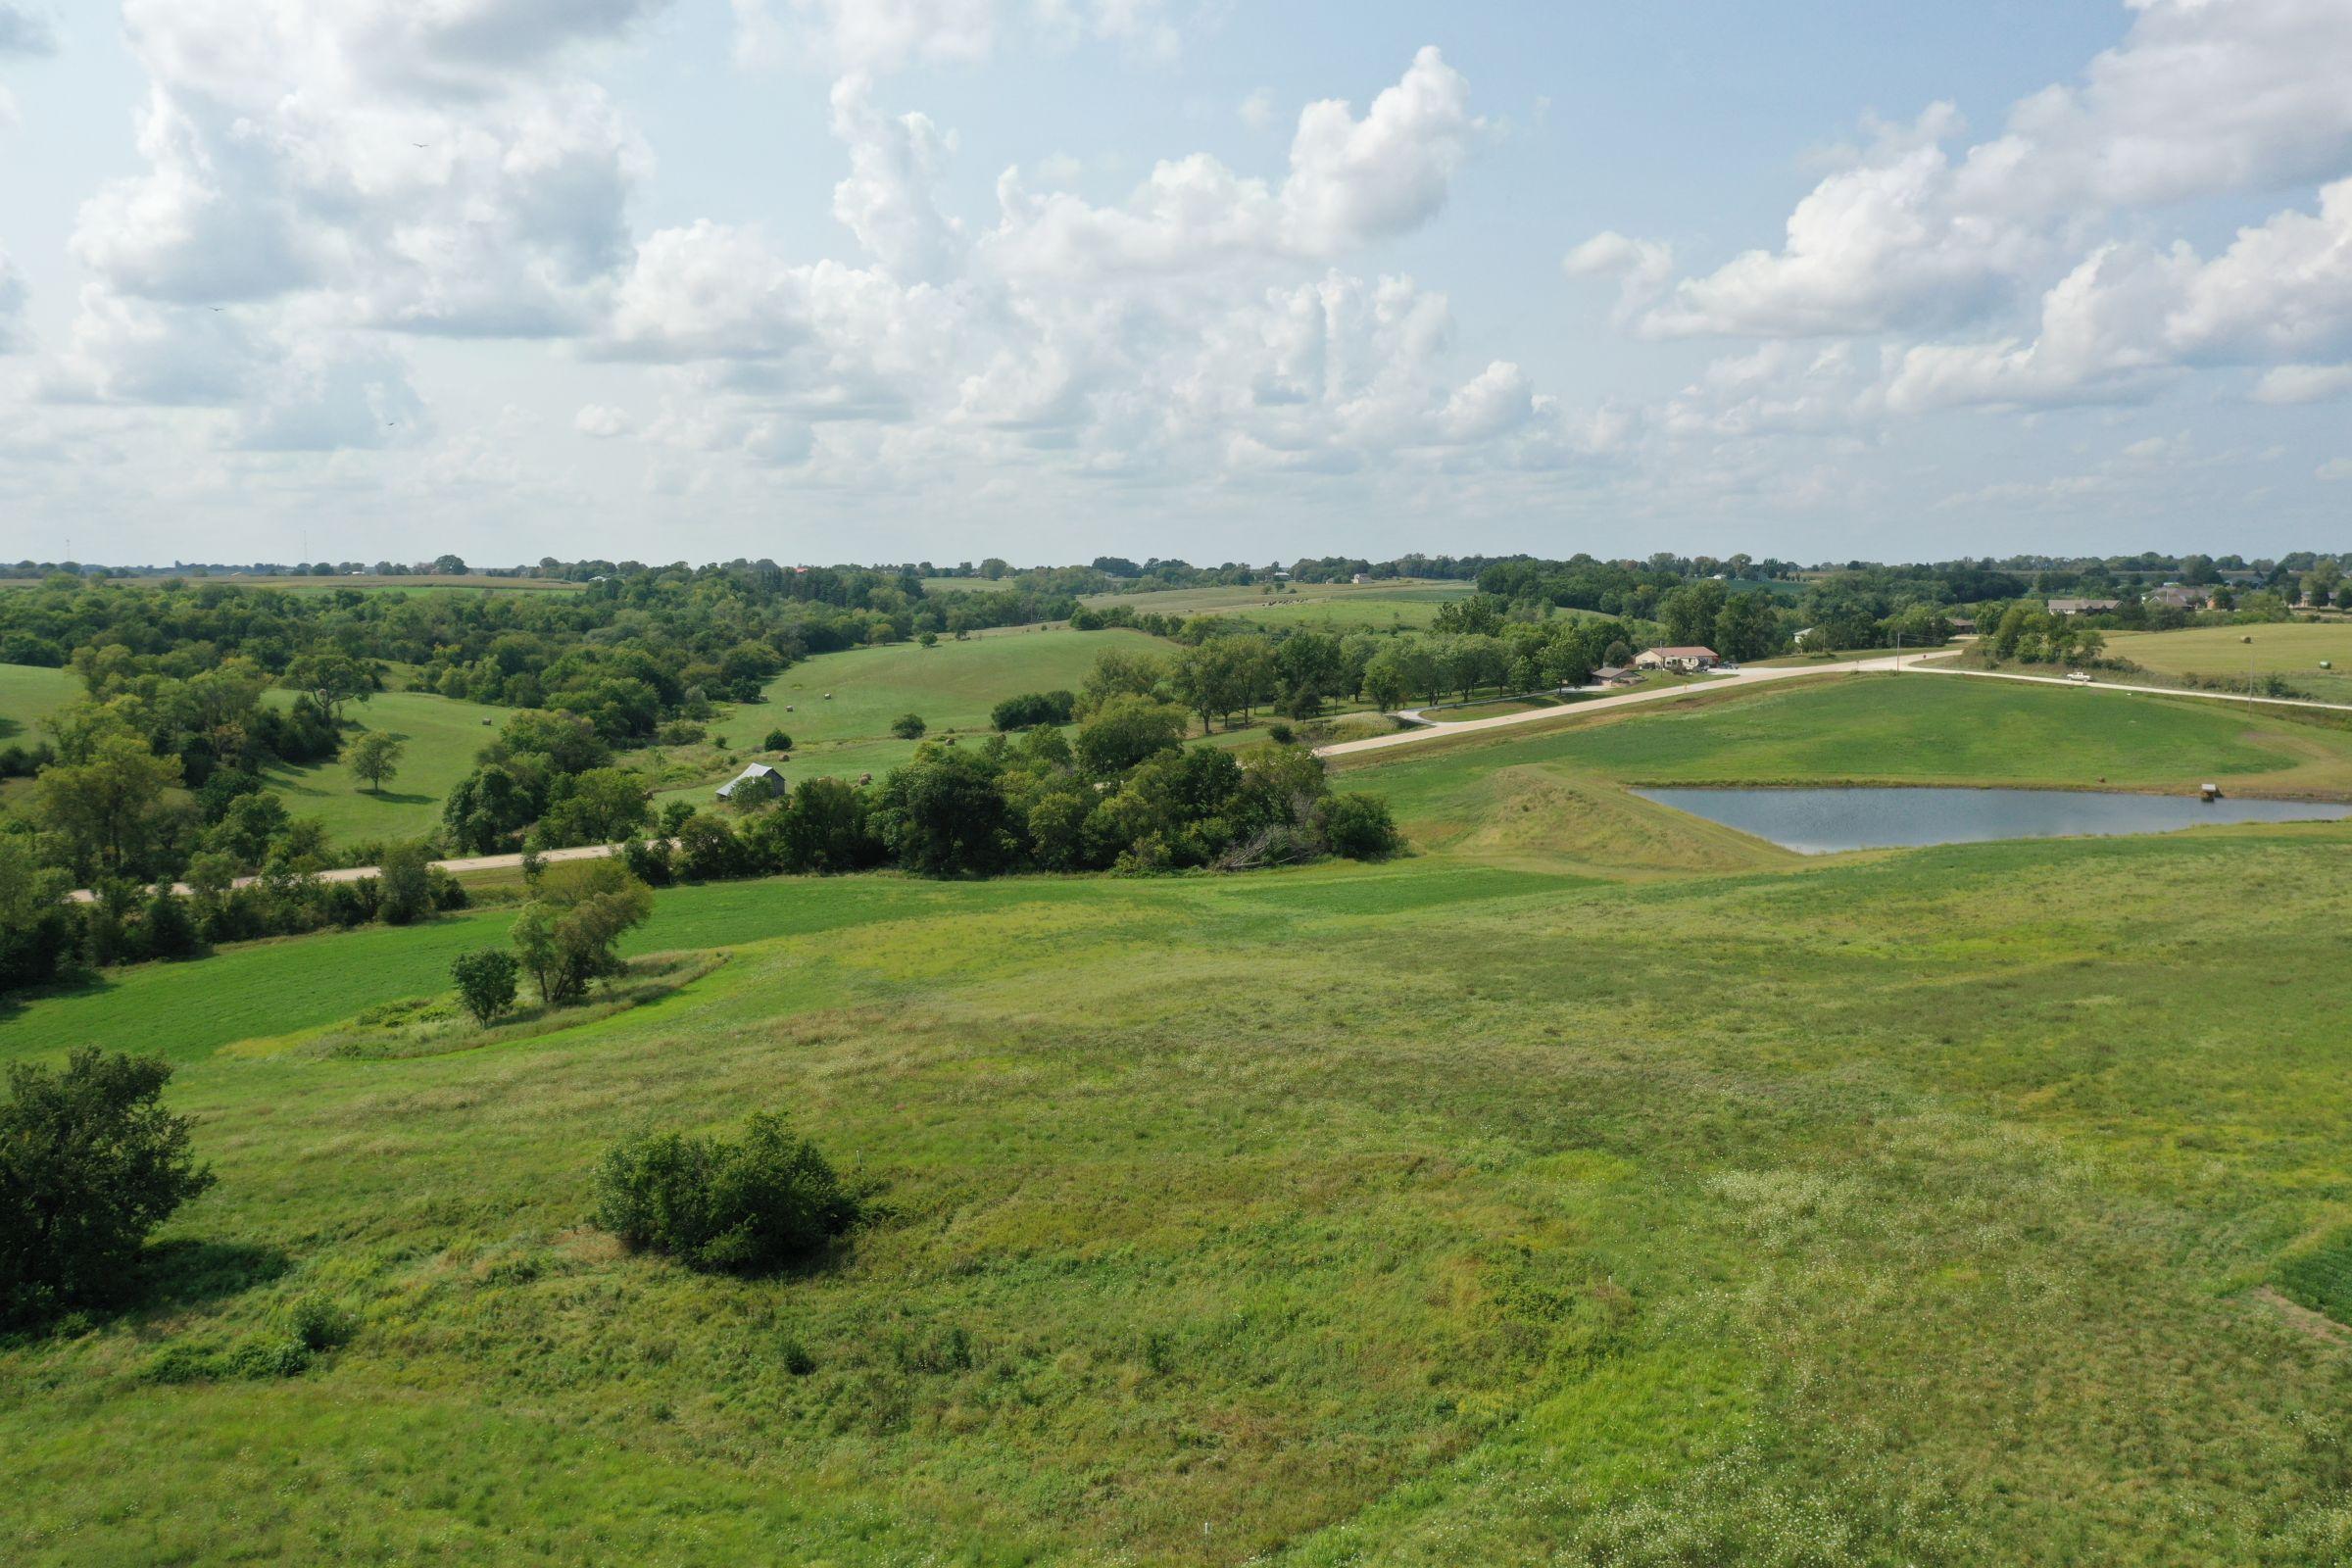 land-warren-county-iowa-9-acres-listing-number-15697-7-2021-08-24-224734.JPG